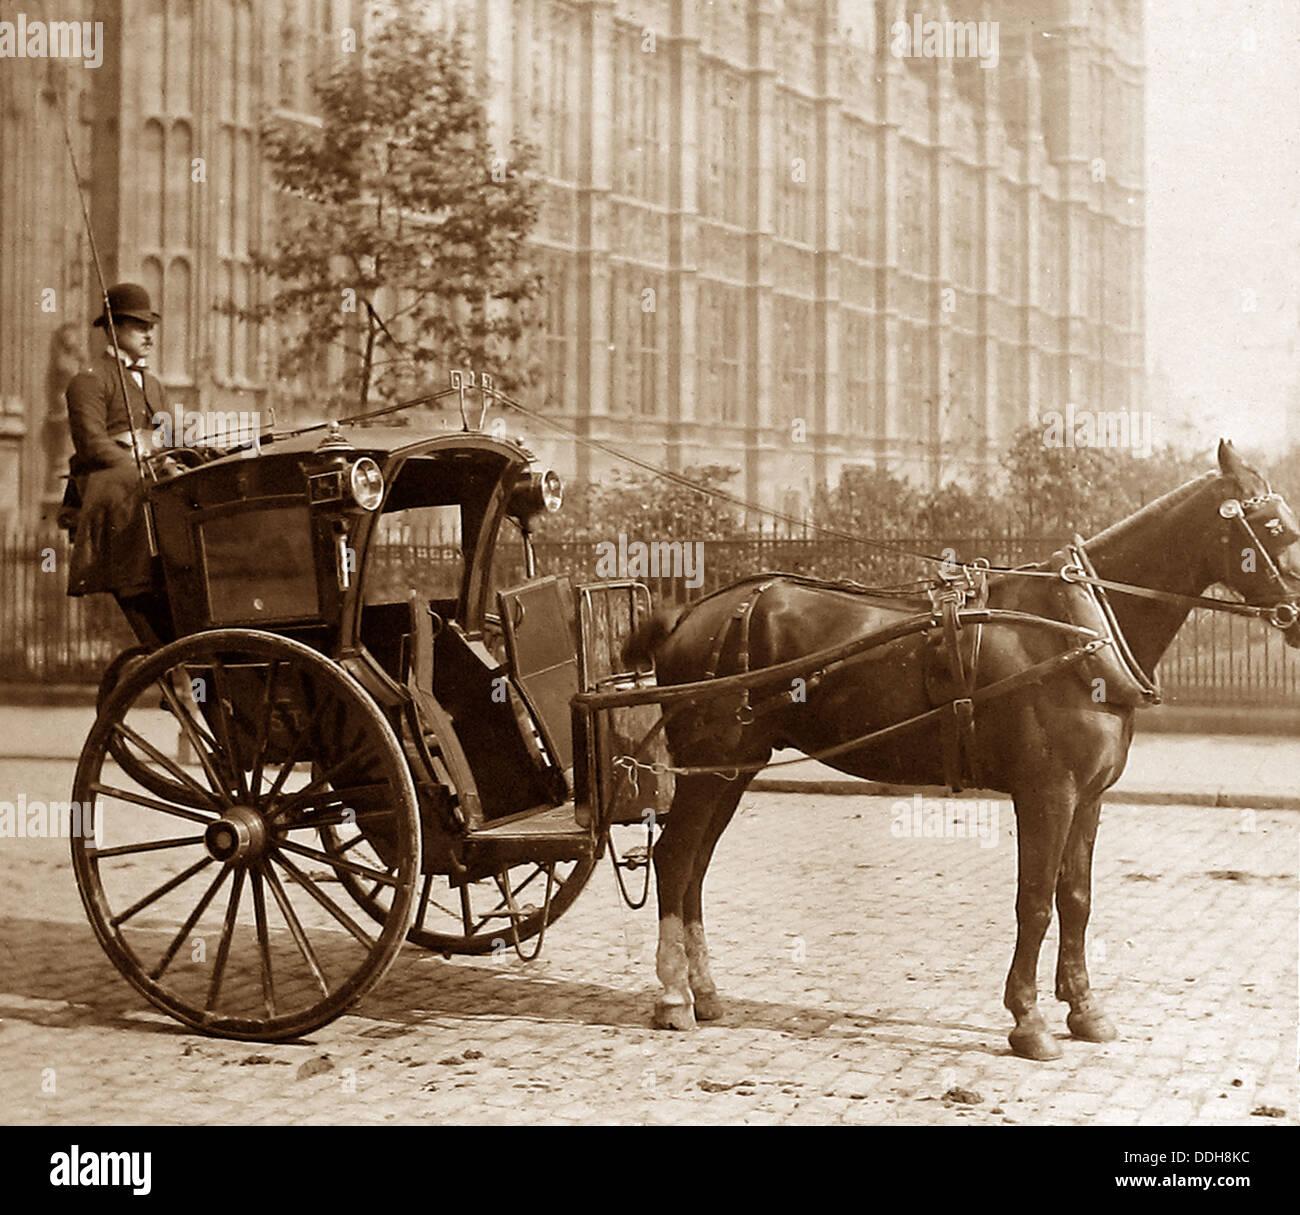 https://i1.wp.com/c8.alamy.com/comp/DDH8KC/london-hansom-cab-victorian-period-DDH8KC.jpg